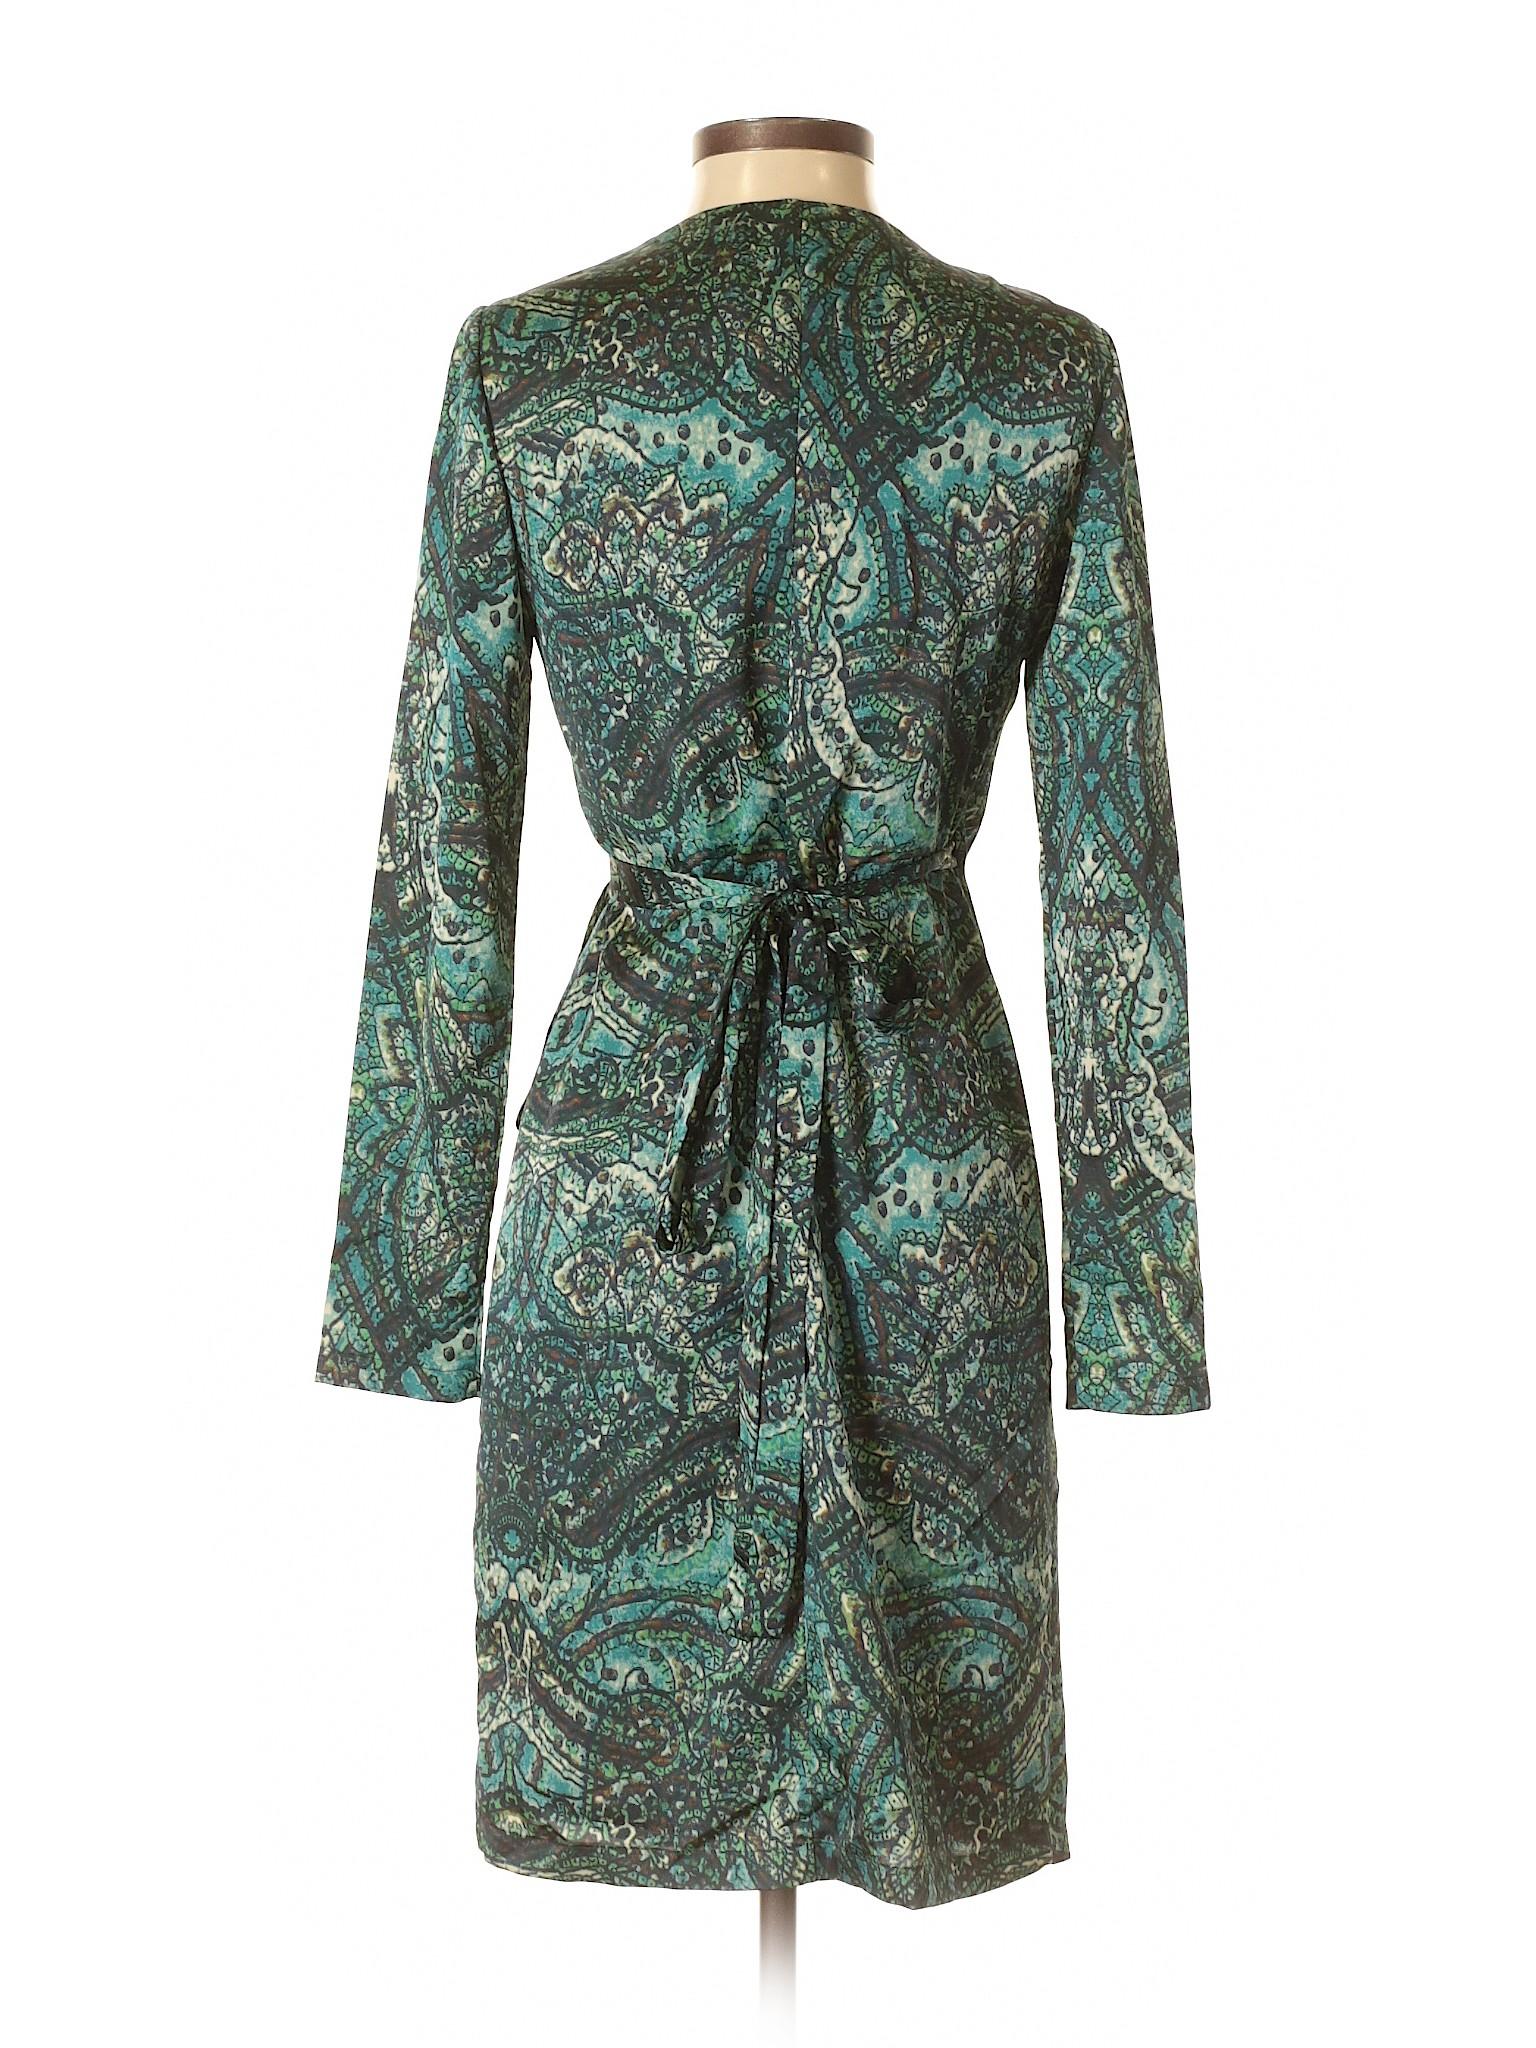 Melani Casual Selling Antonio Selling Dress Antonio twR1zqp